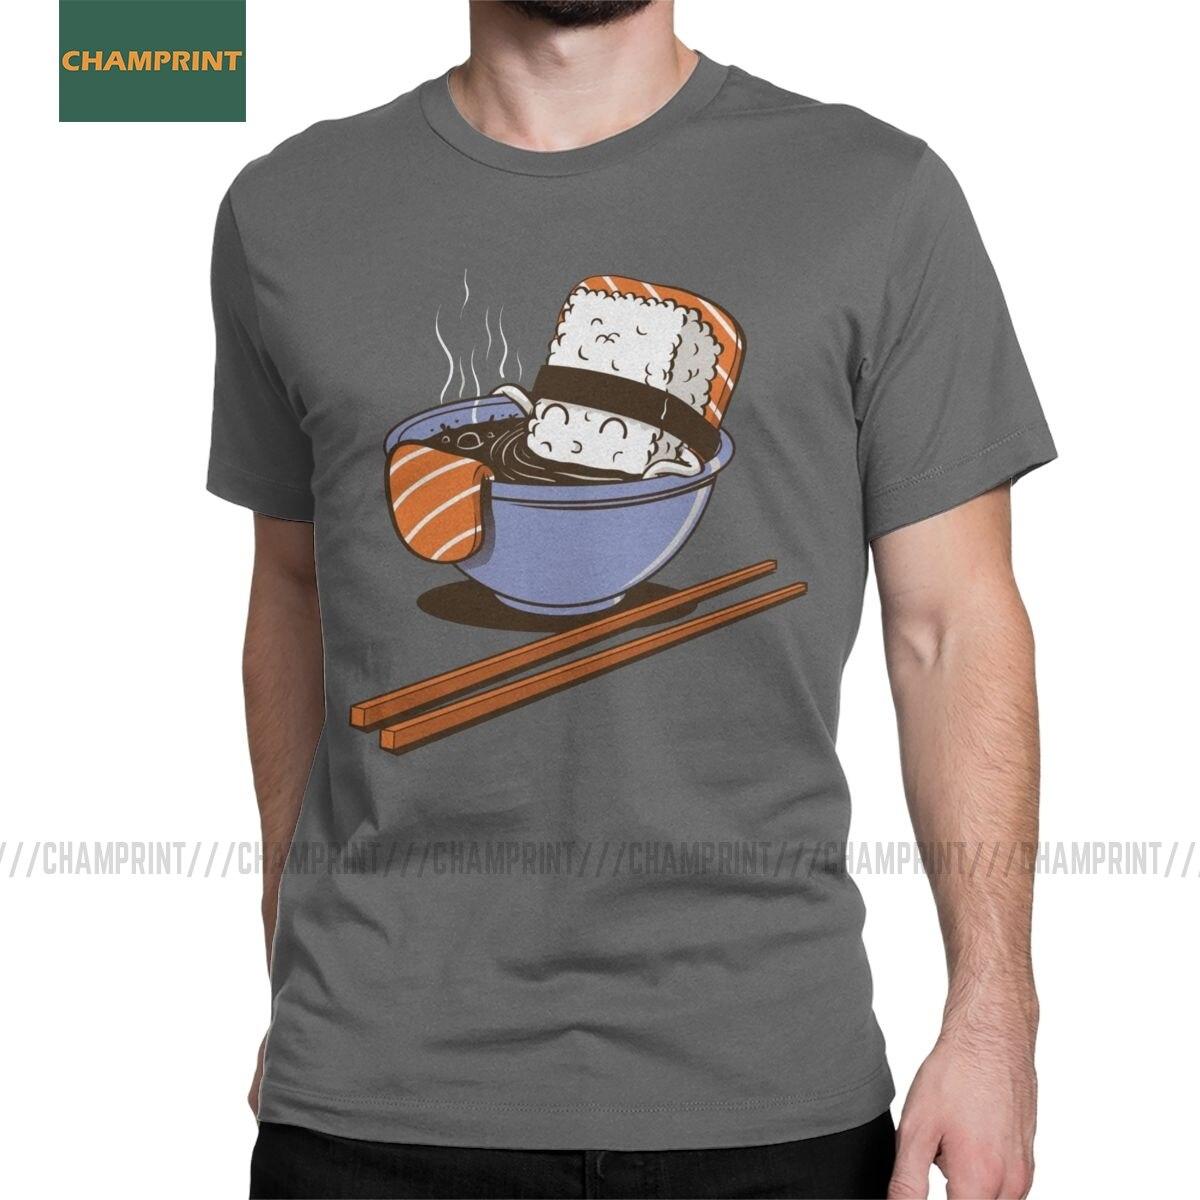 Camiseta de algodón comida Sushi camisetas de manga corta Japón lindo Kawaii Wasabi Sashimi arroz dibujos animados Nigiri salmón japonés camisetas